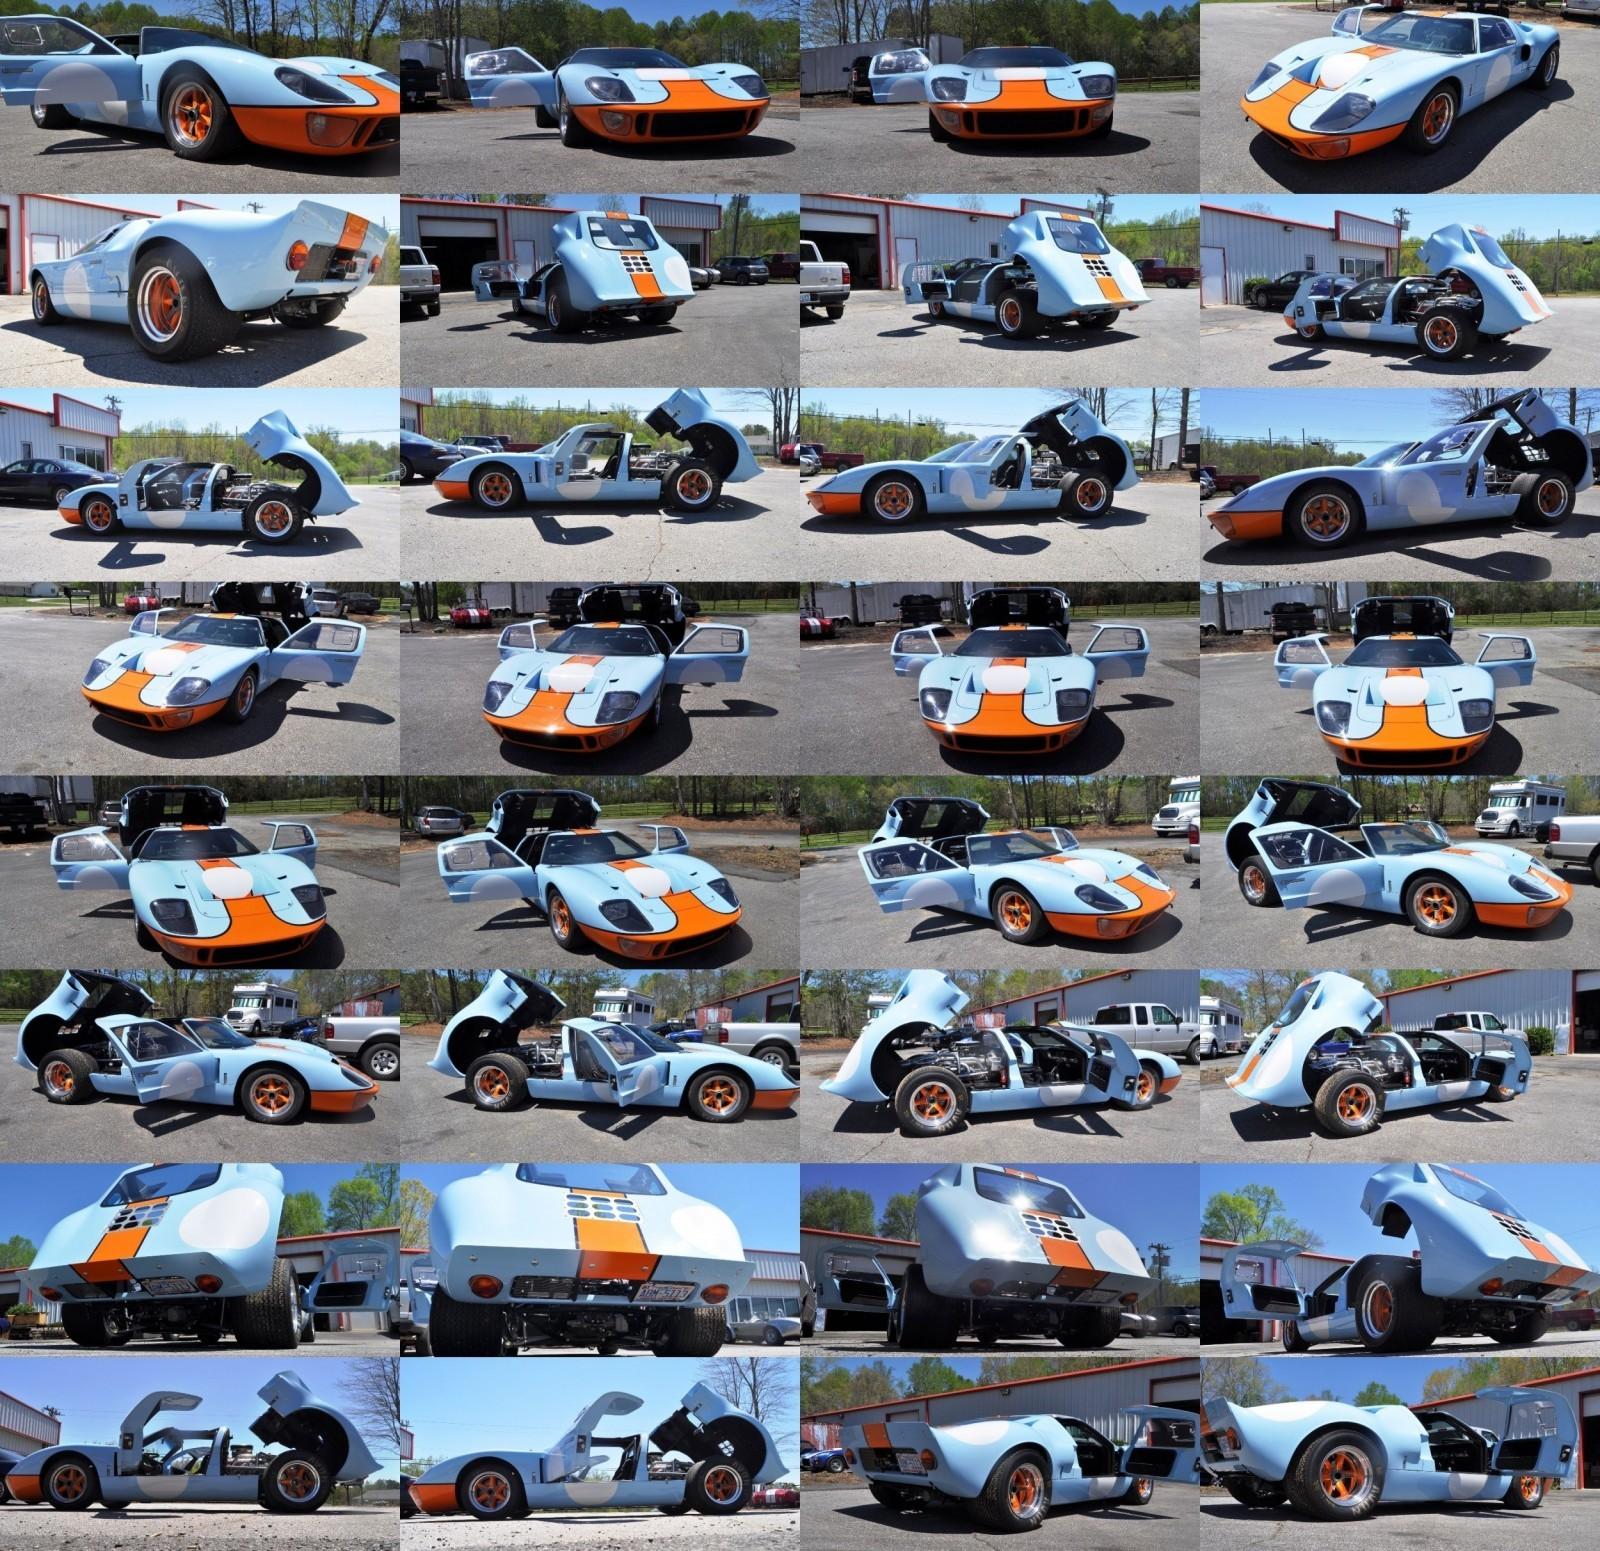 2014 Superformance GT40 Mark I - MEGA Photo Shoot and Ride-Along Videos 83-tile